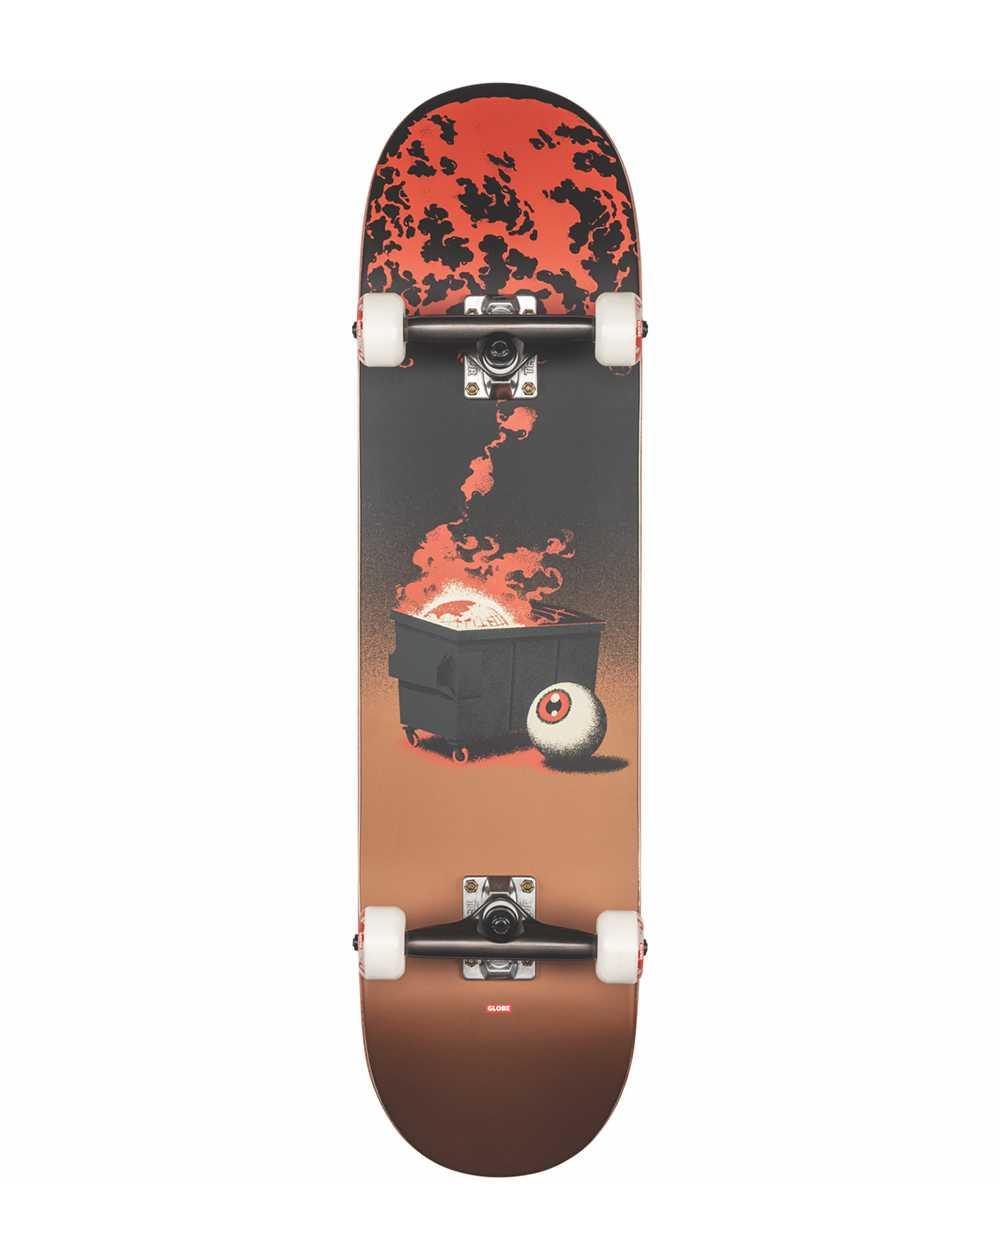 "Globe Skate Montado G2 On the Brink 8.25"" Dumpster Fire"